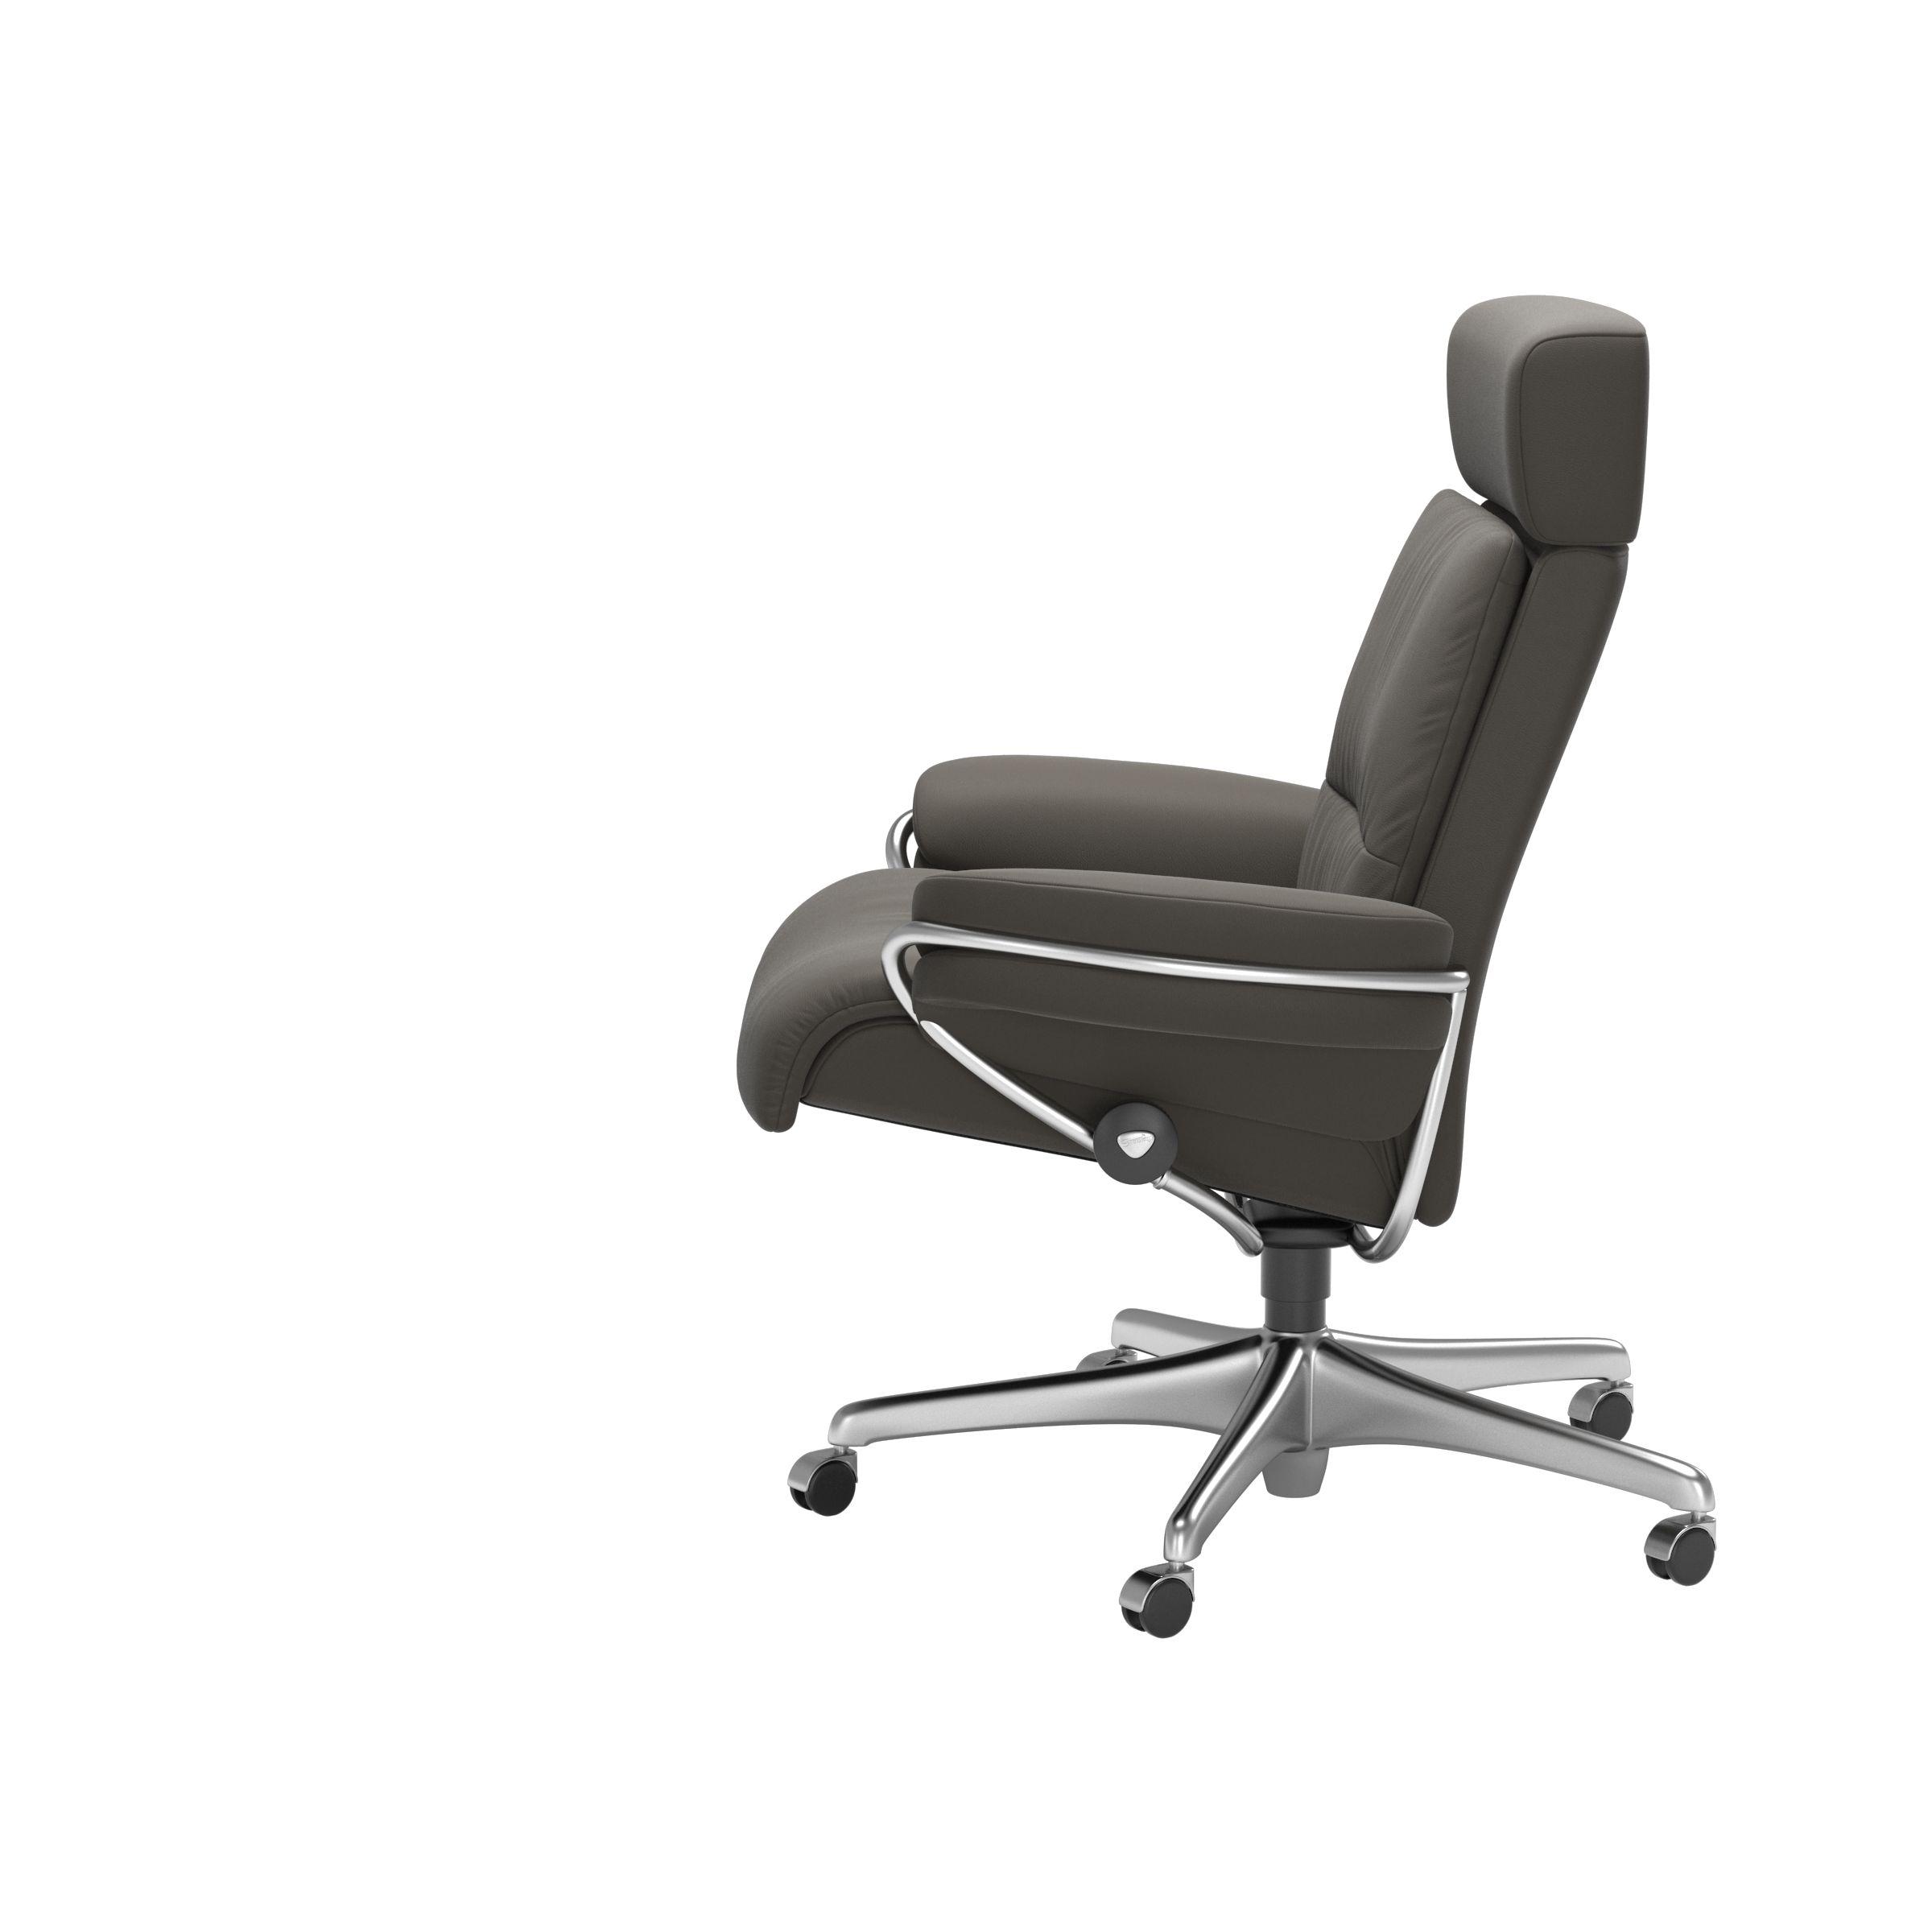 Stressless Tokyo Office Chair